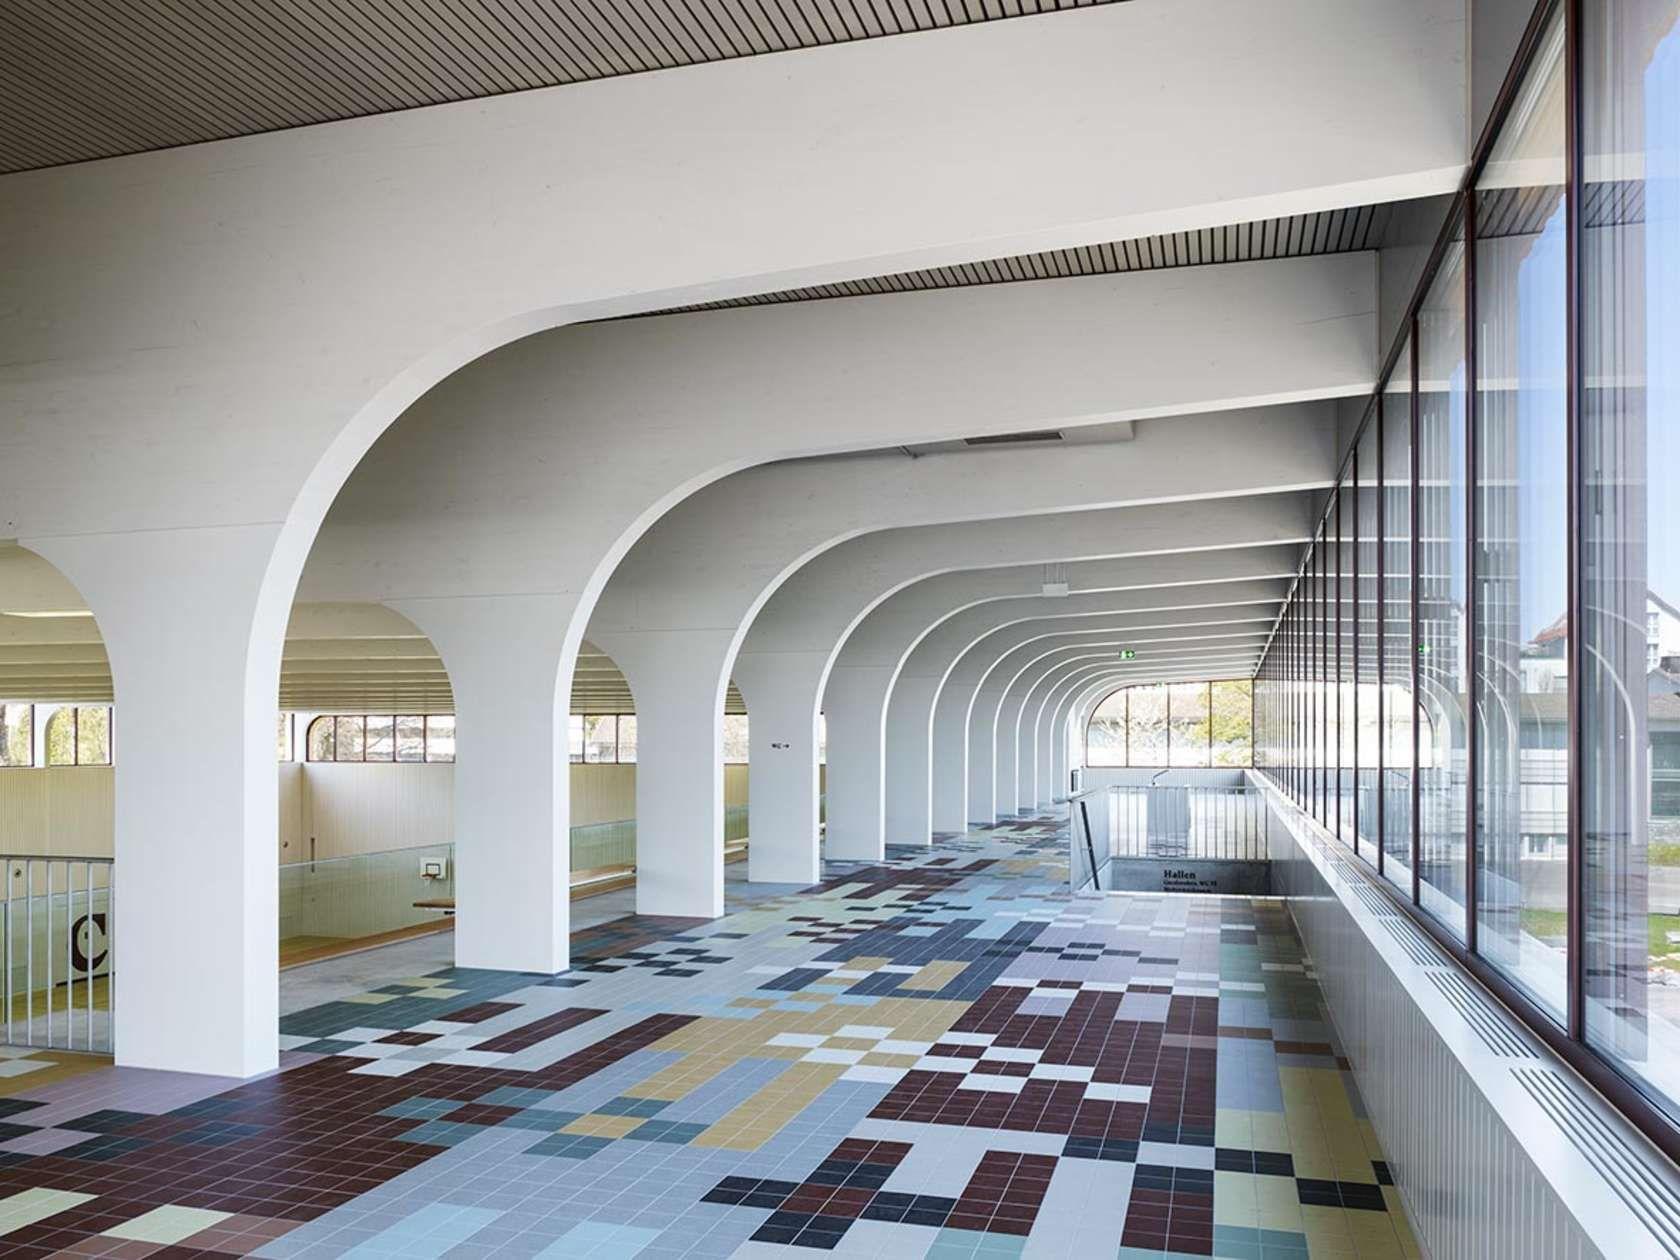 Firm pool architekten project multipurpose hall for Pool design school